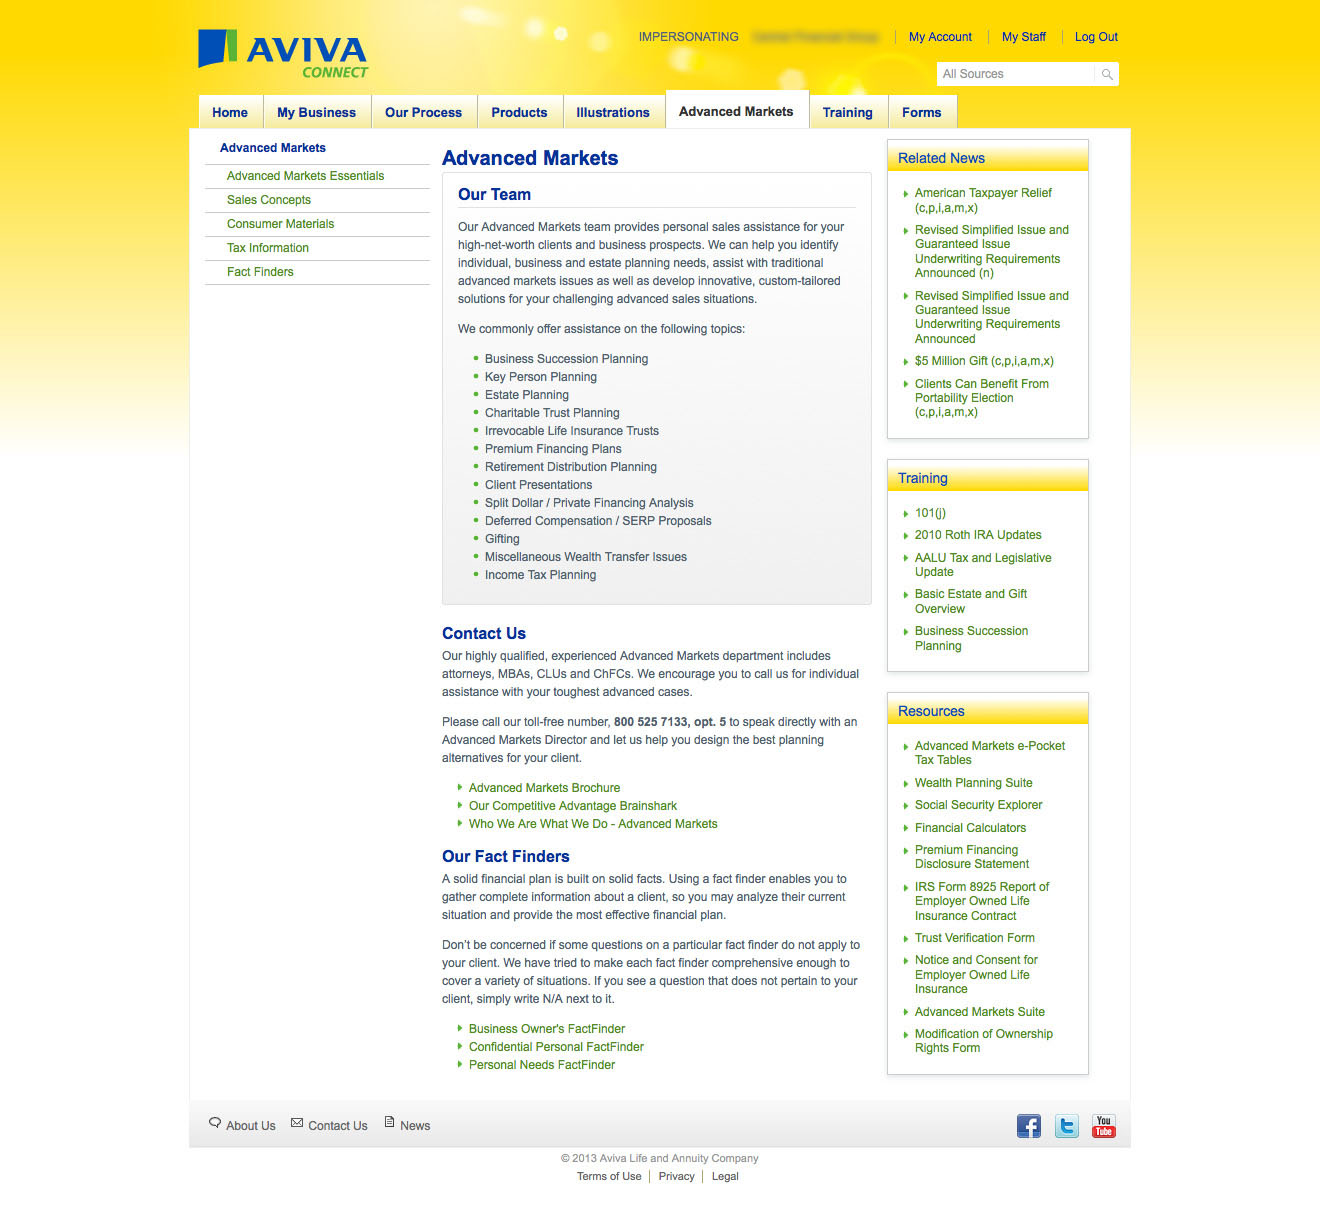 AvivaConnect_Advanced Markets 2013-07-11 11-29-01.jpeg